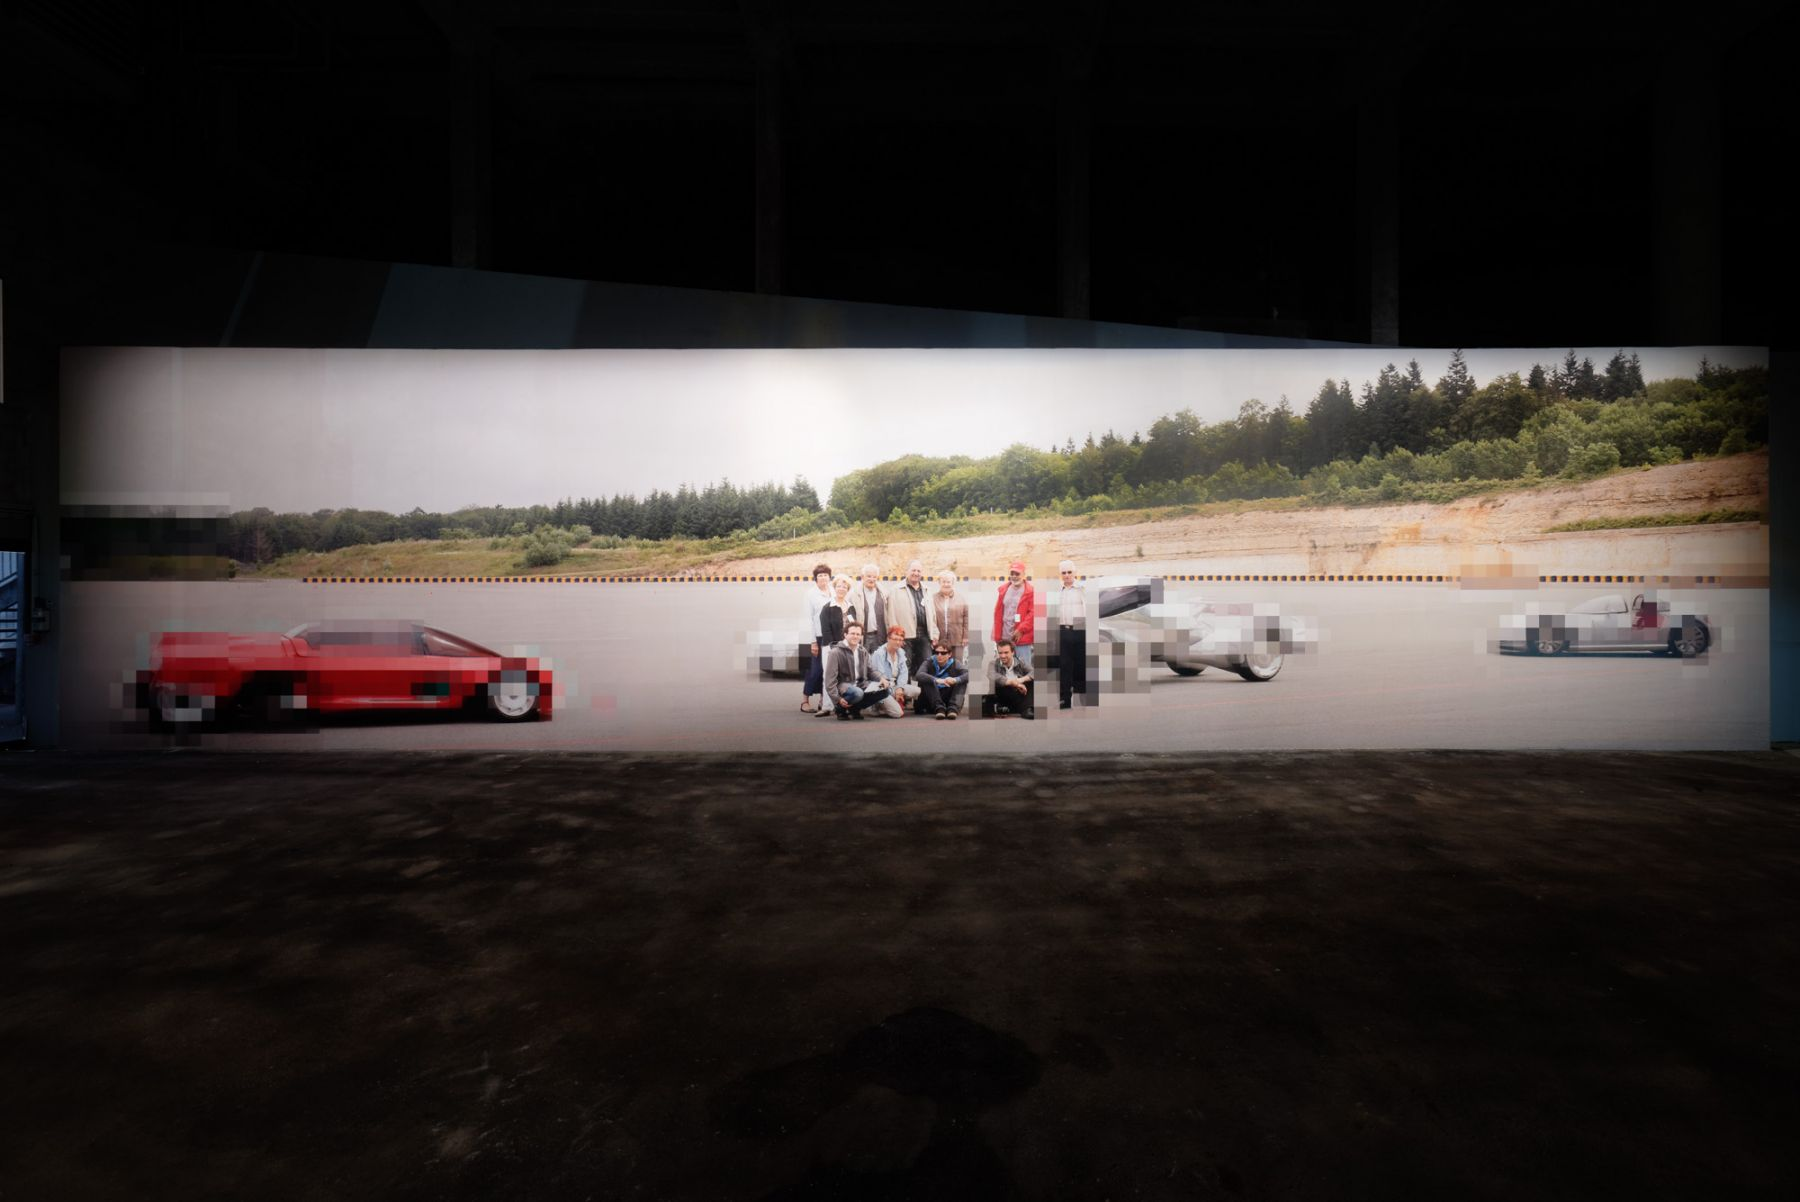 In Low Resolution. Installation view, 2014. Palais de Tokyo, Paris.